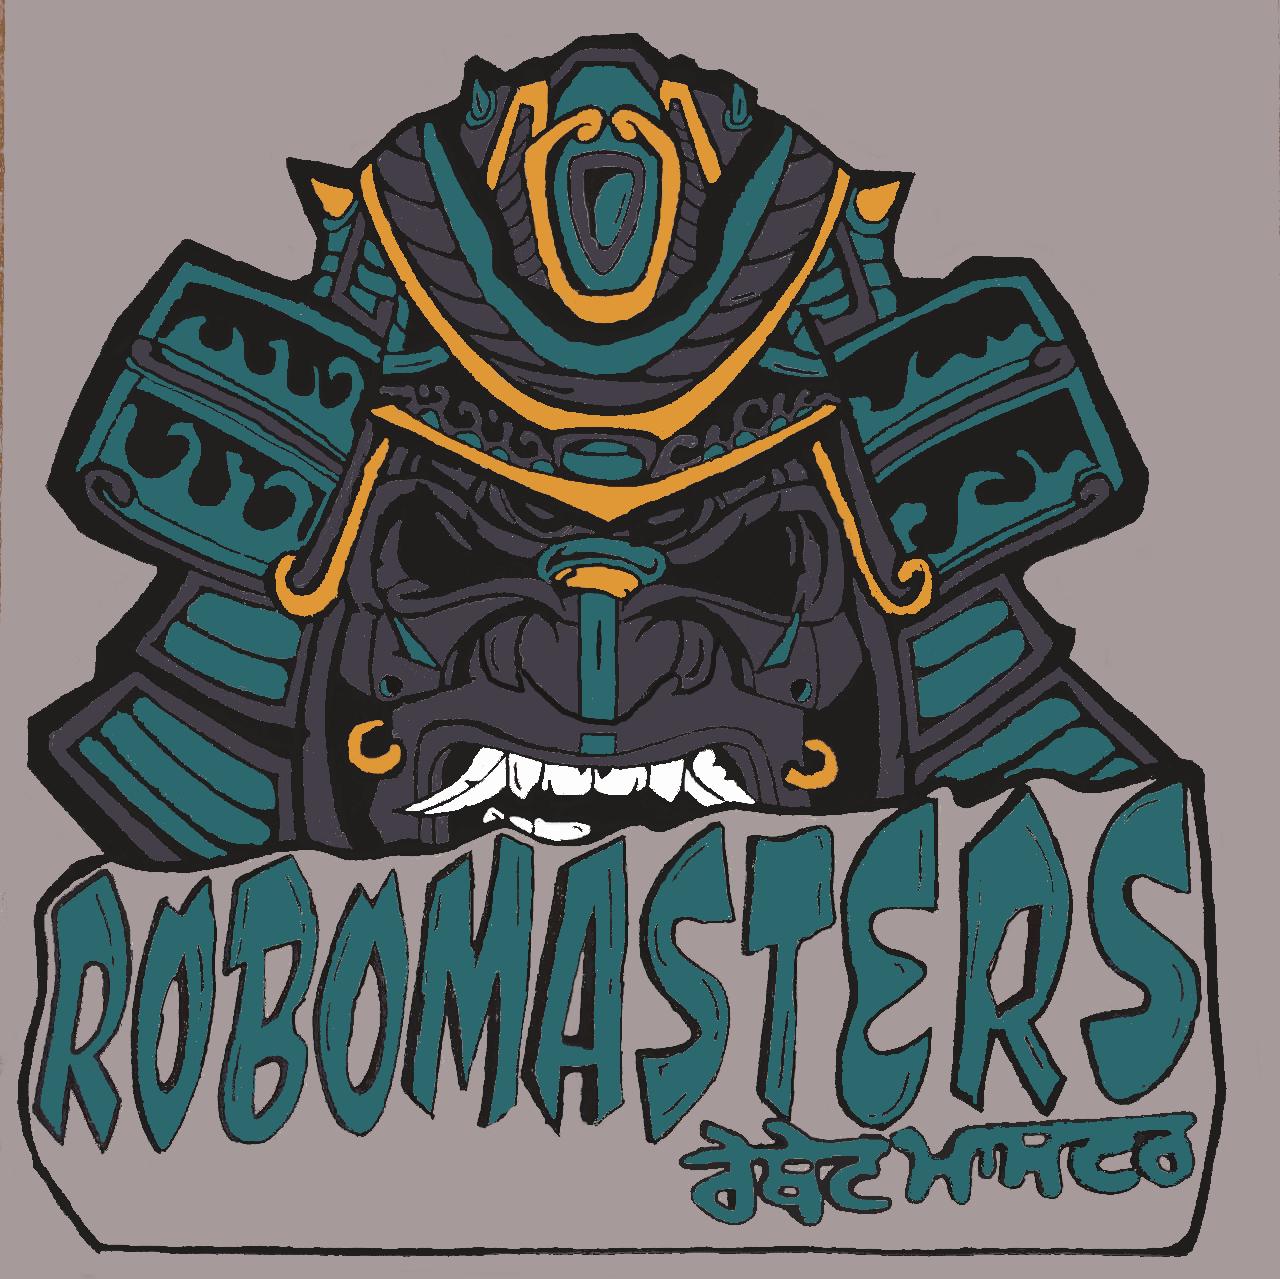 NOCO VEX Robotics VRC Tournament